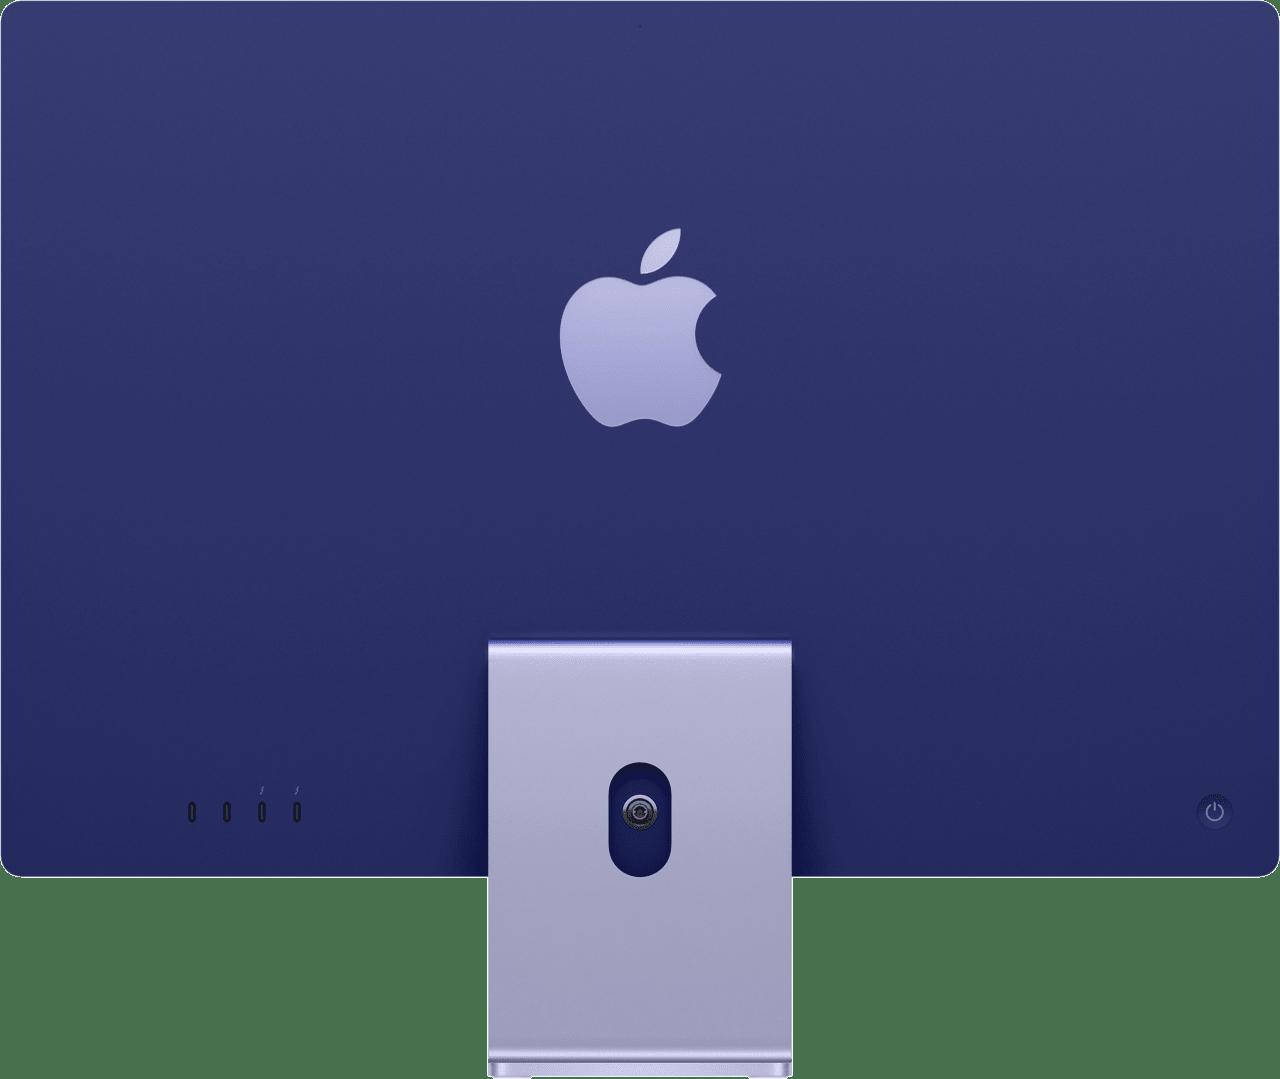 "Purple Apple 24"" iMac (Mid 2021) All-in-One - Apple M1 - 8GB - 512GB SSD - Apple Integrated 8-core GPU.2"